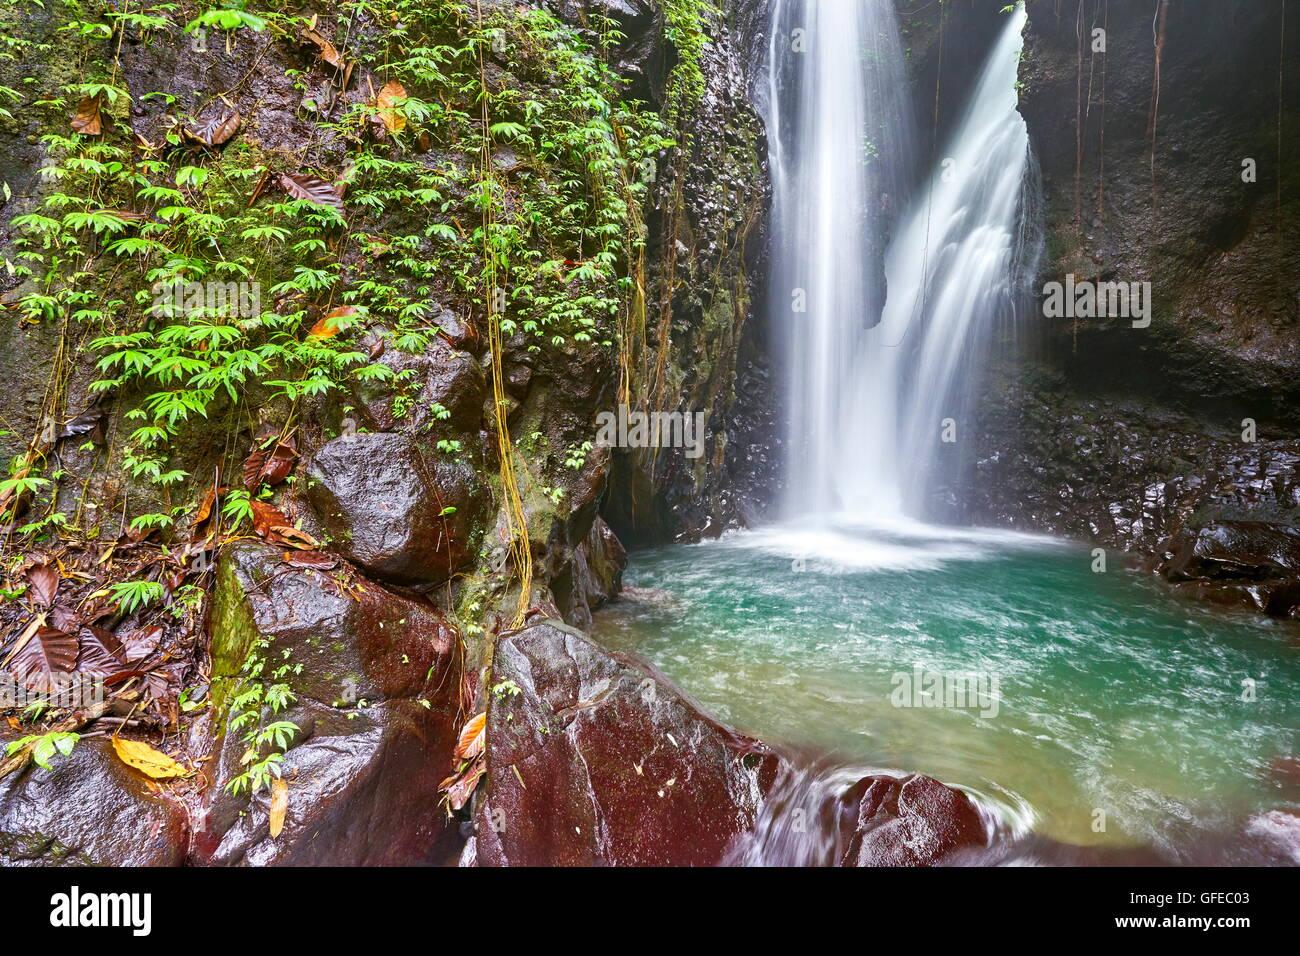 La cascada de Git Git, Bali, Indonesia Imagen De Stock